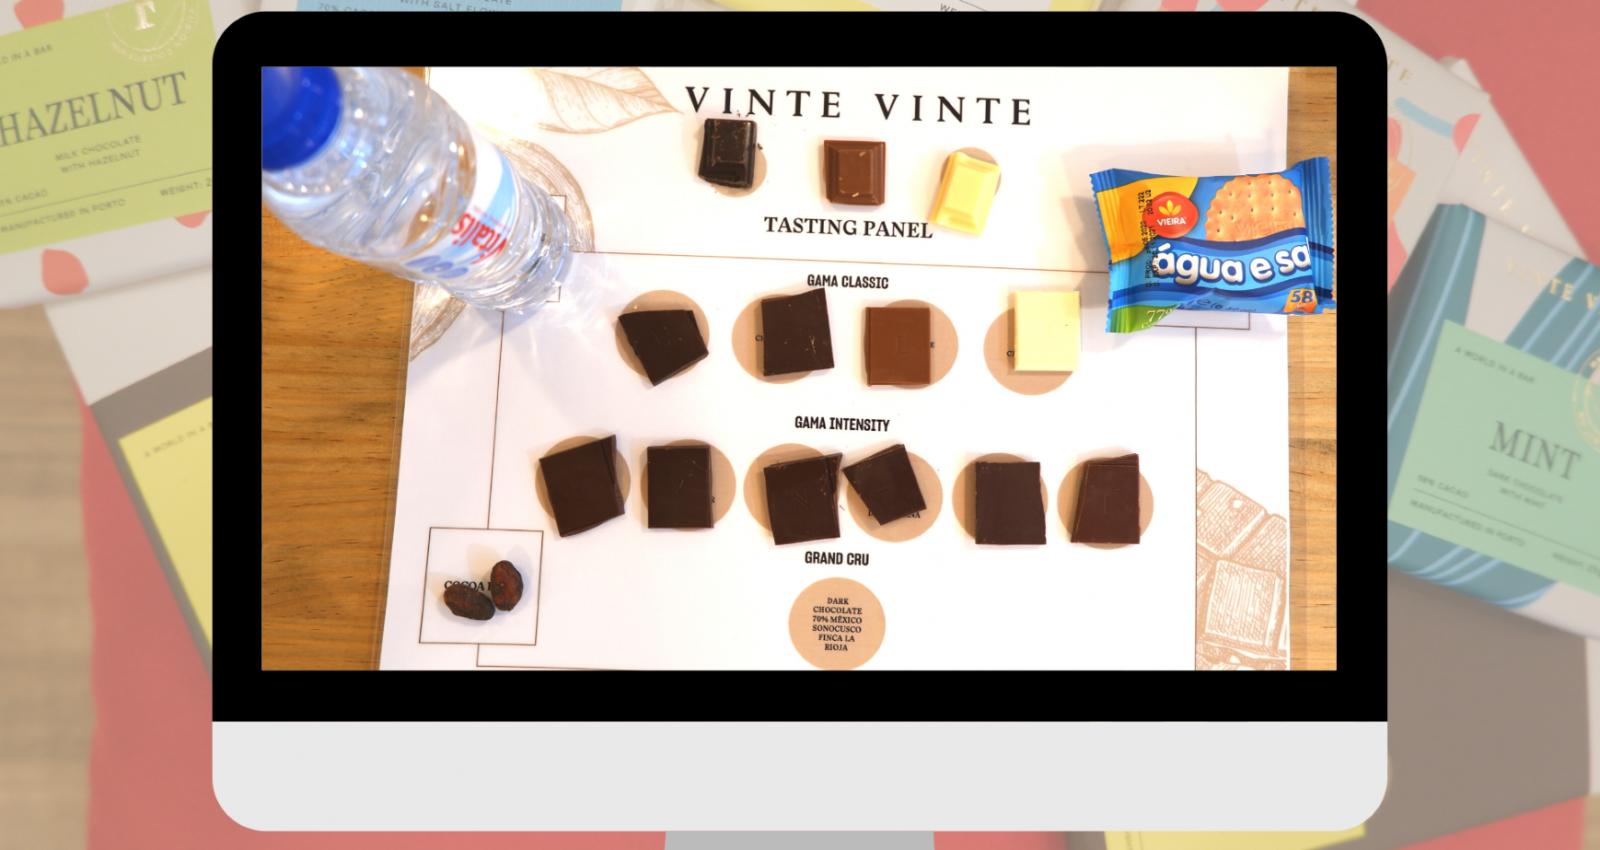 EVENTO WOW PRESENTACION CHOCOLATE VINTE VINTE CATA